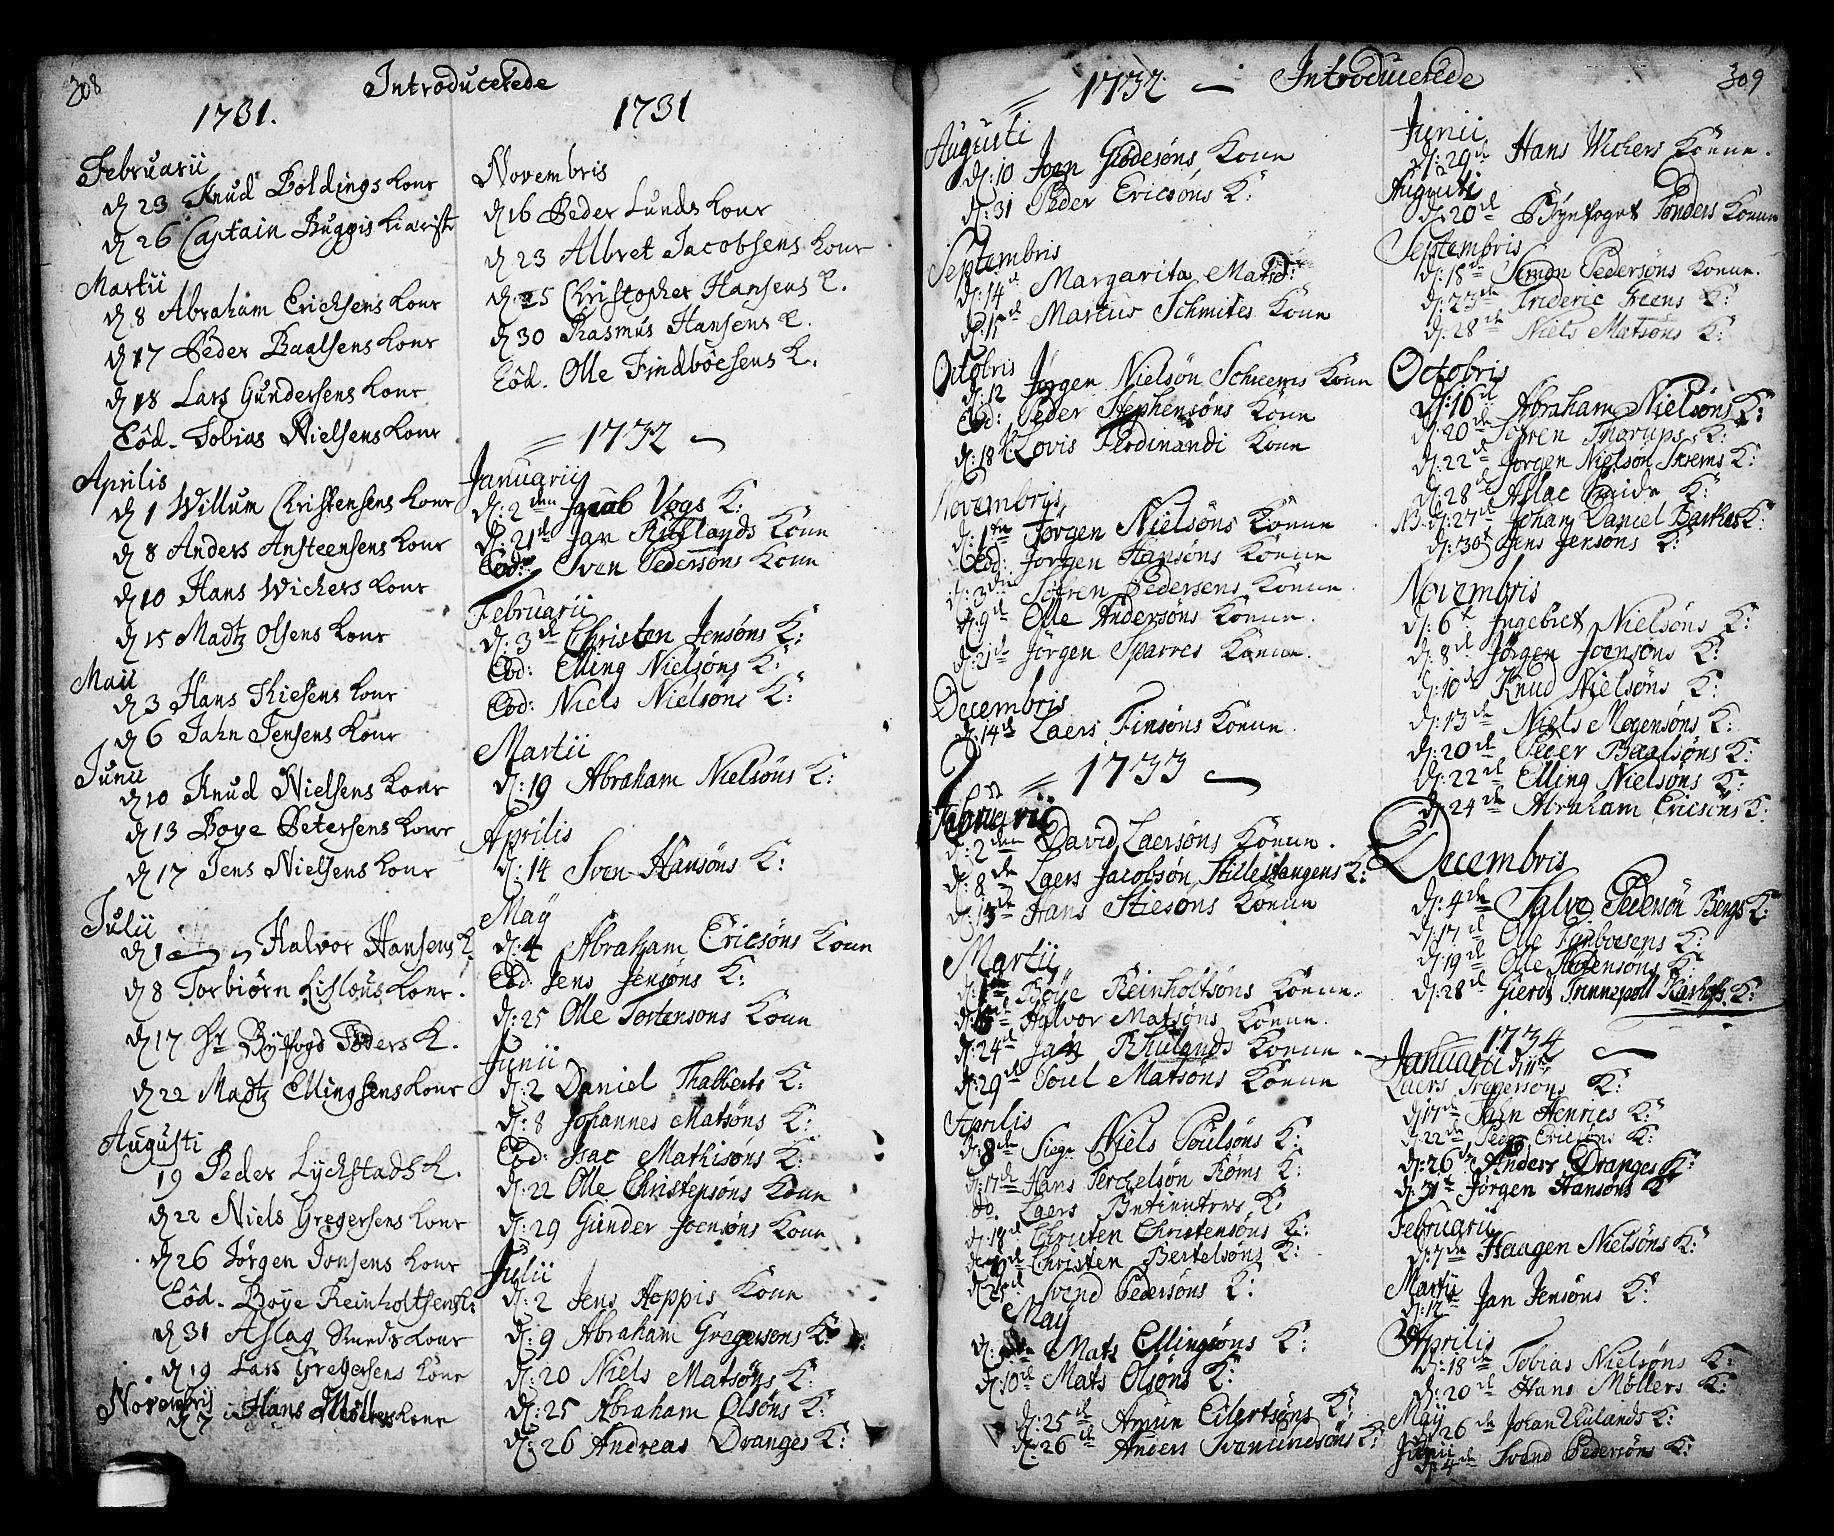 SAKO, Kragerø kirkebøker, F/Fa/L0001: Ministerialbok nr. 1, 1702-1766, s. 308-309